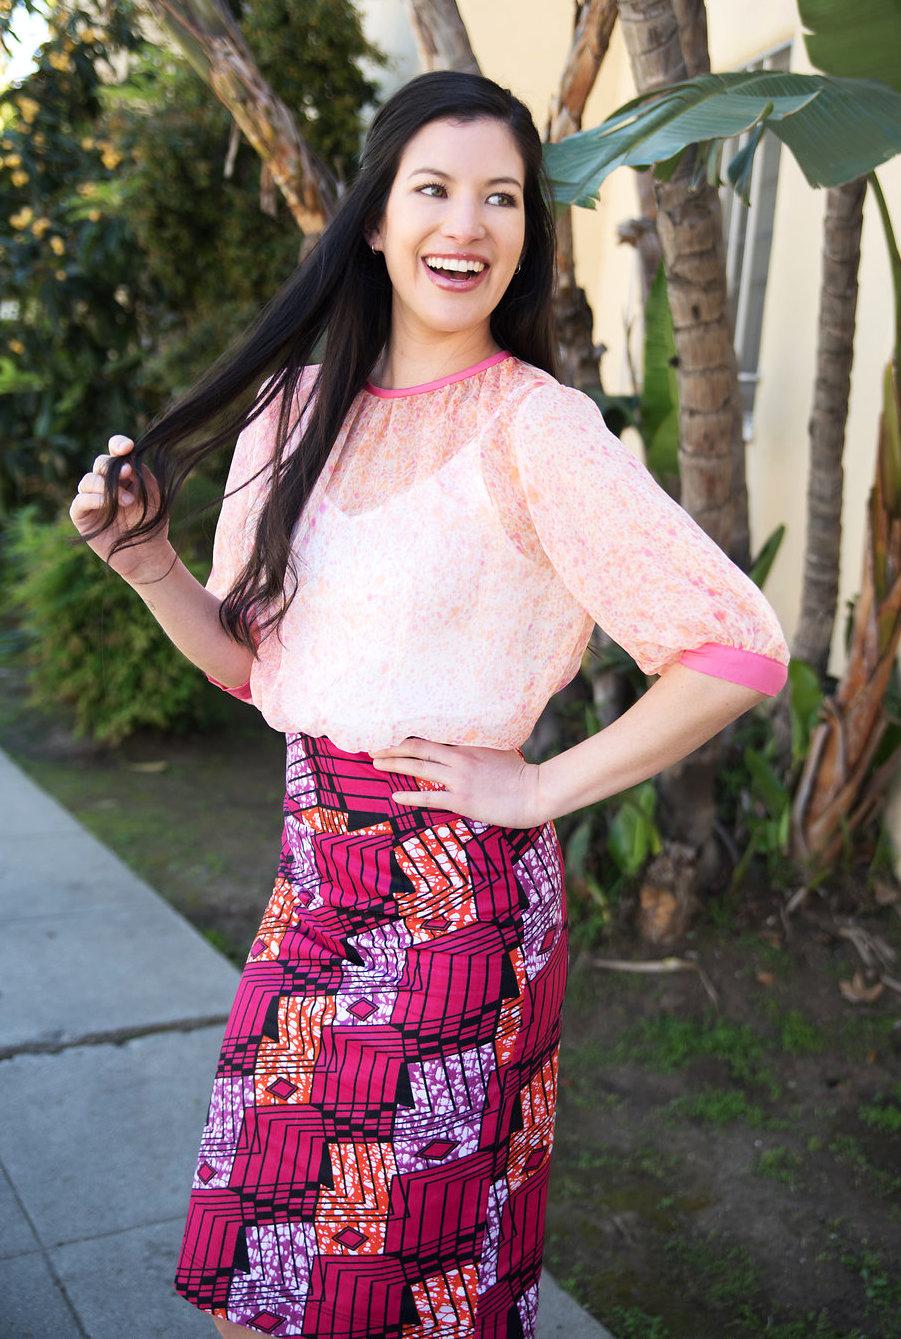 Handpainted chiffon blouse & African print pencil skirt.